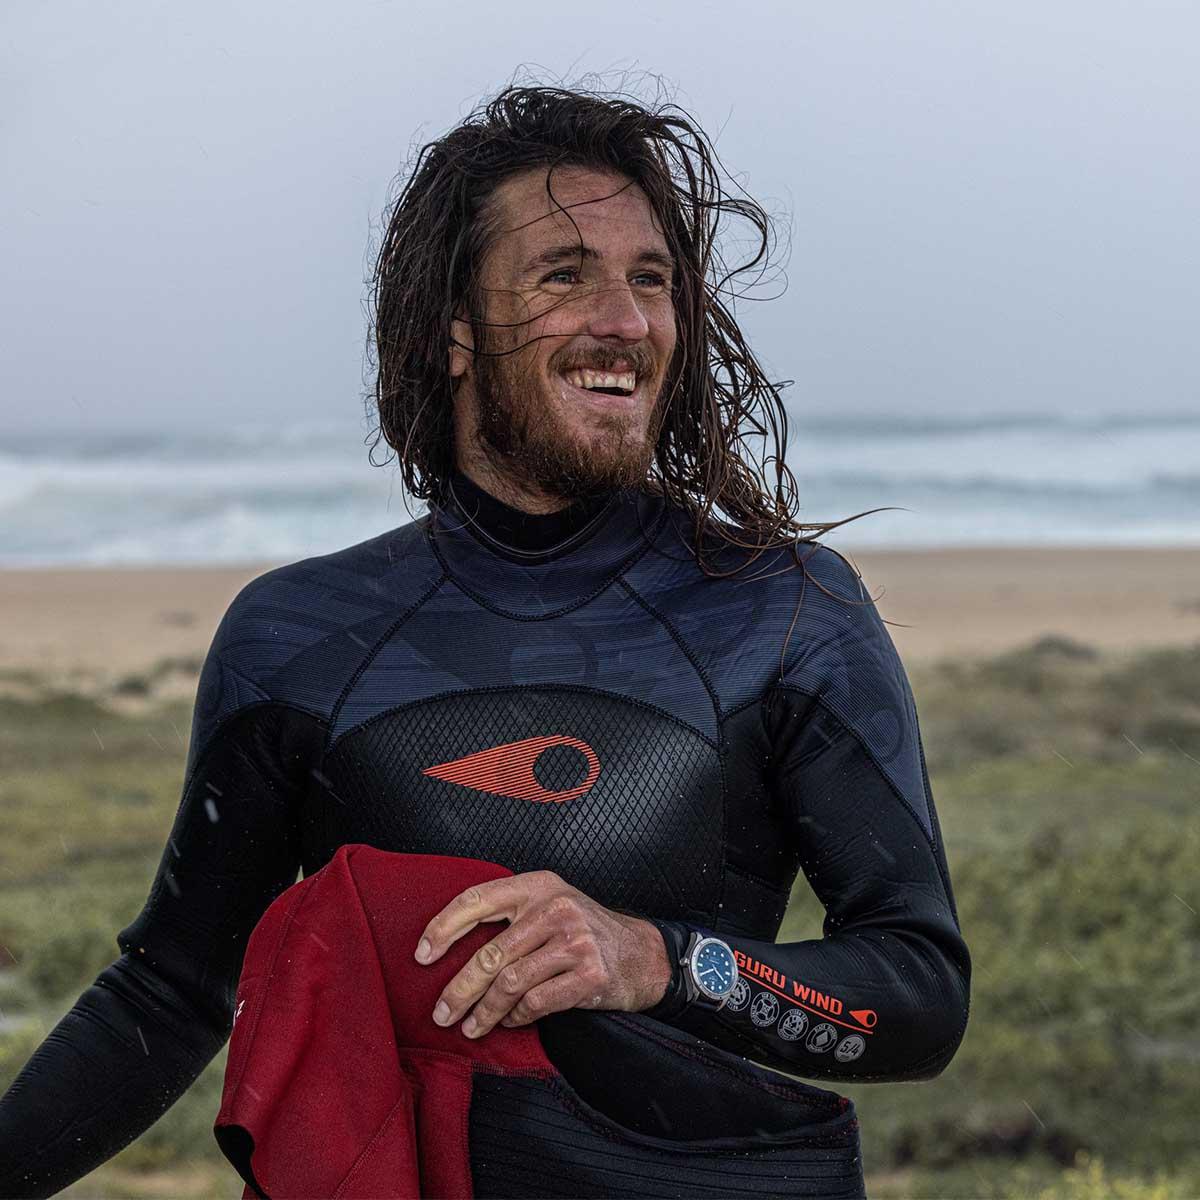 montre concordia nazaré thomas traversa windsurf